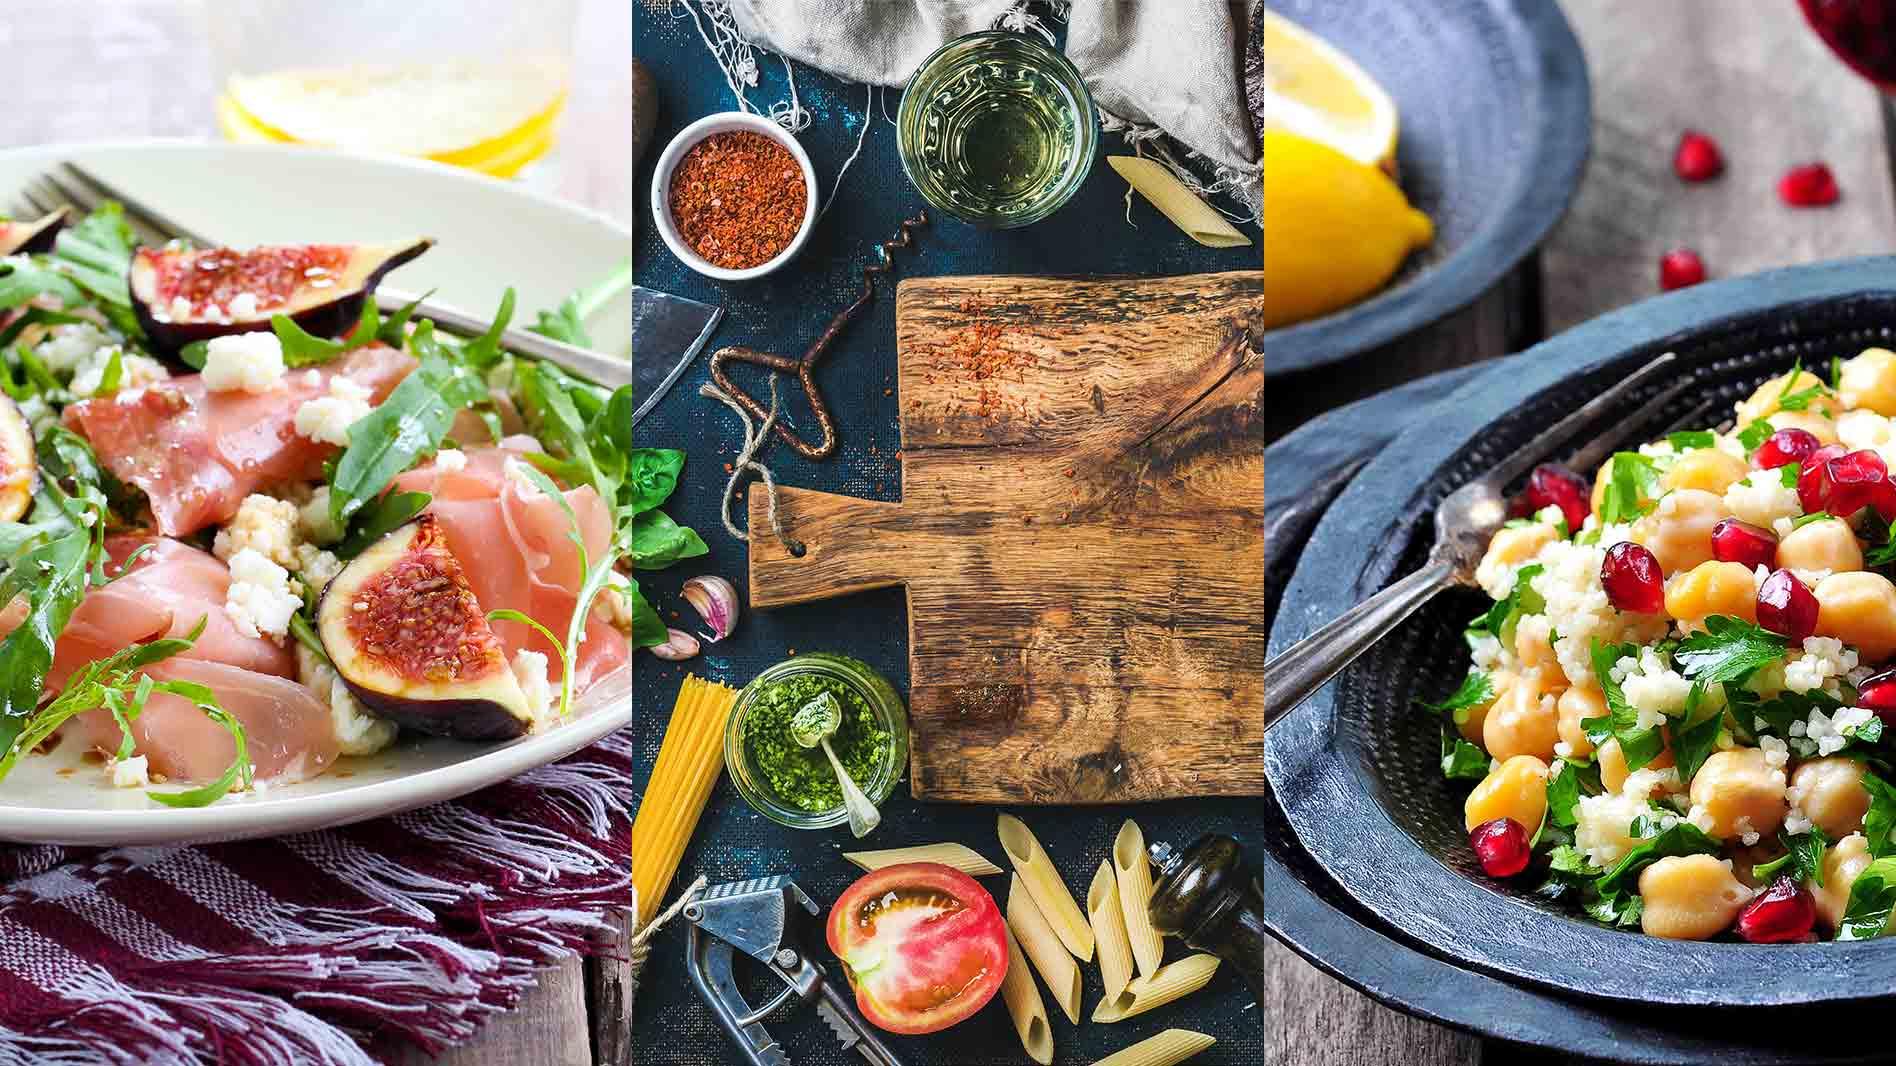 Sensational salads: Recipe inspiration from 4 award-winning chefs